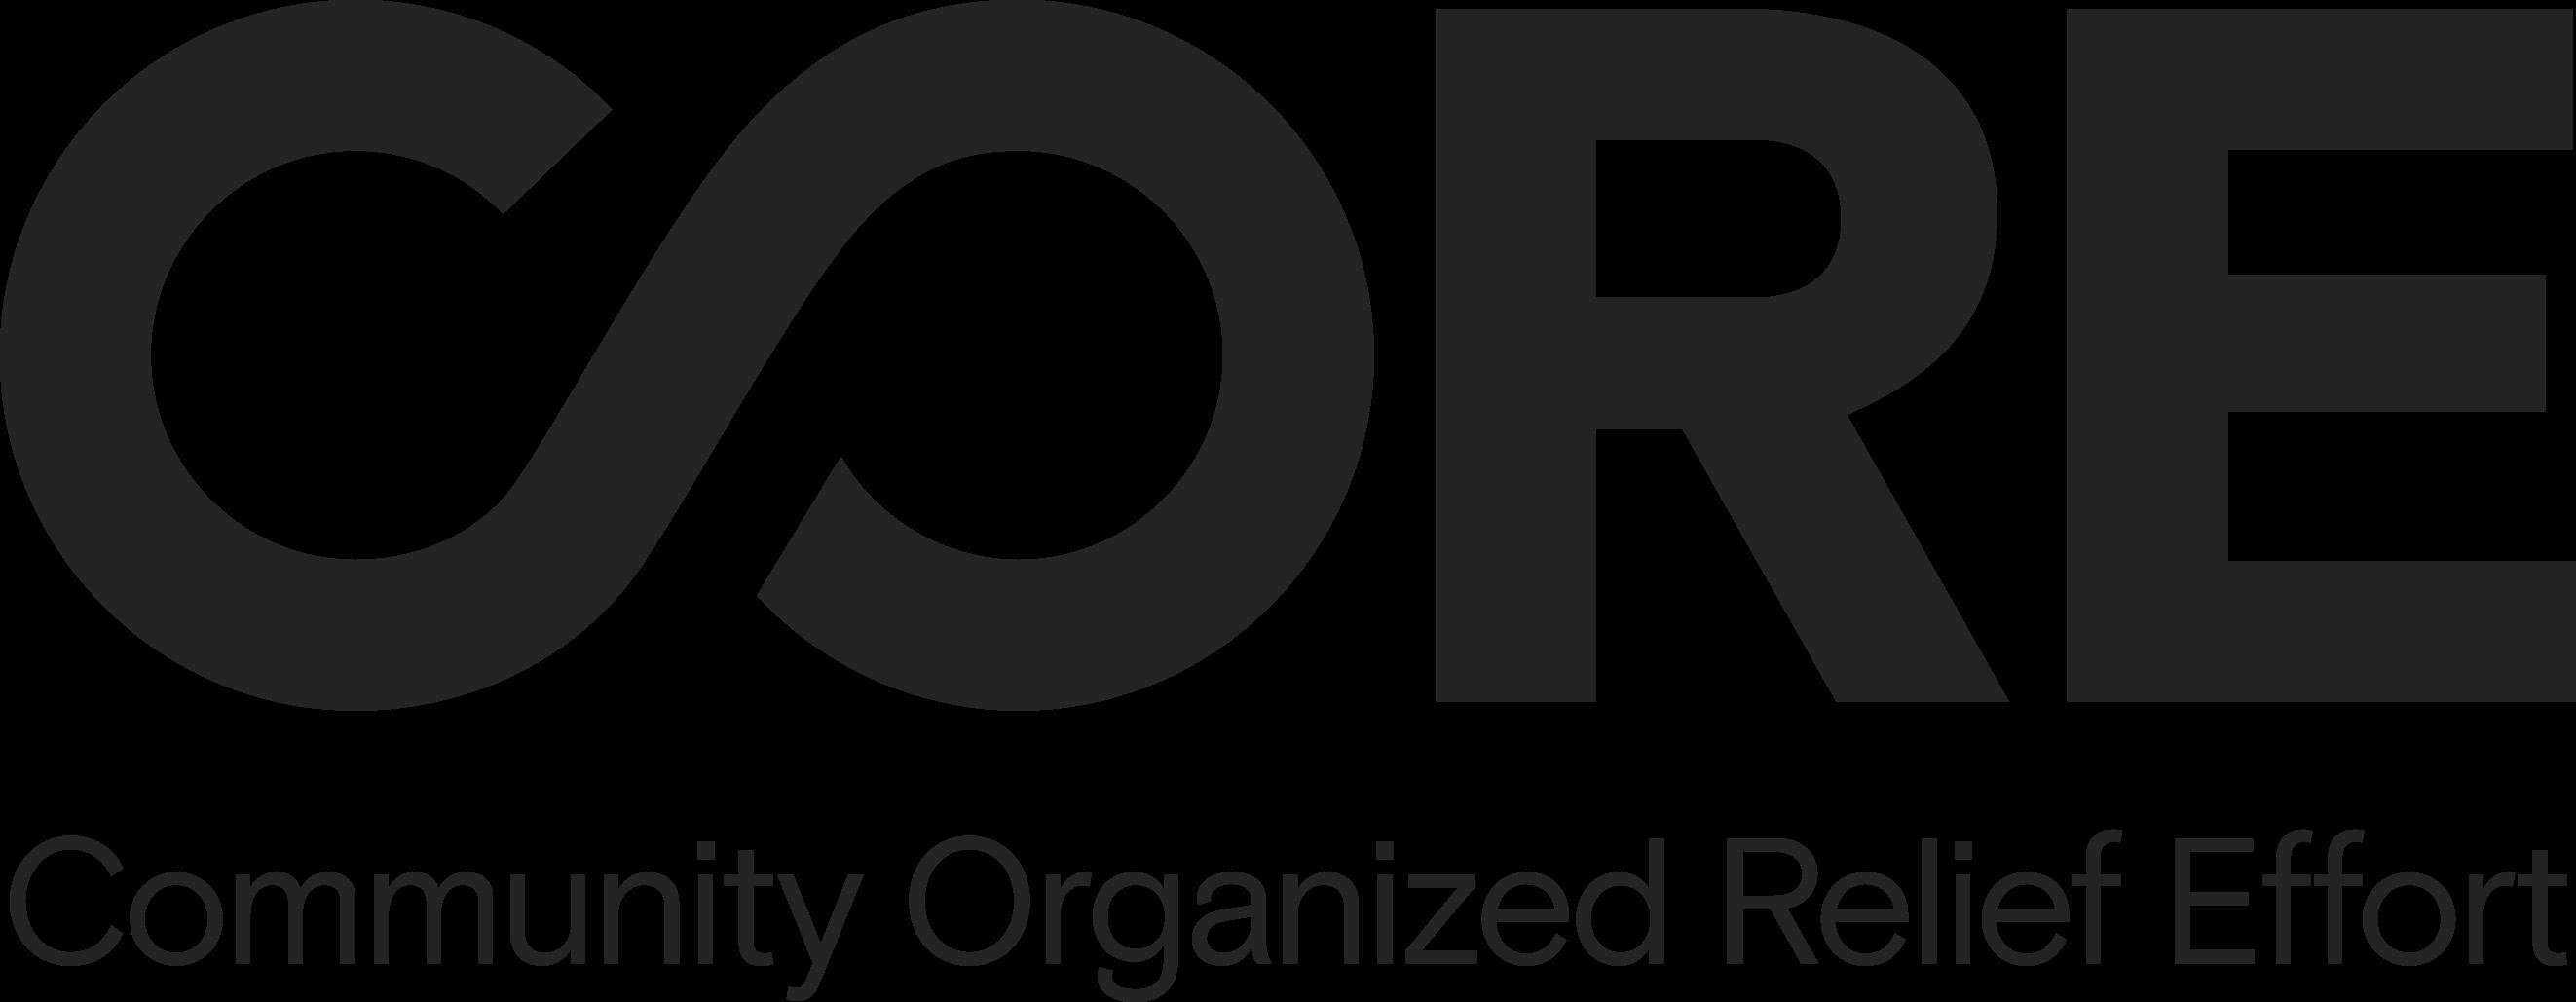 CORE Community Organized Relief Effort logo